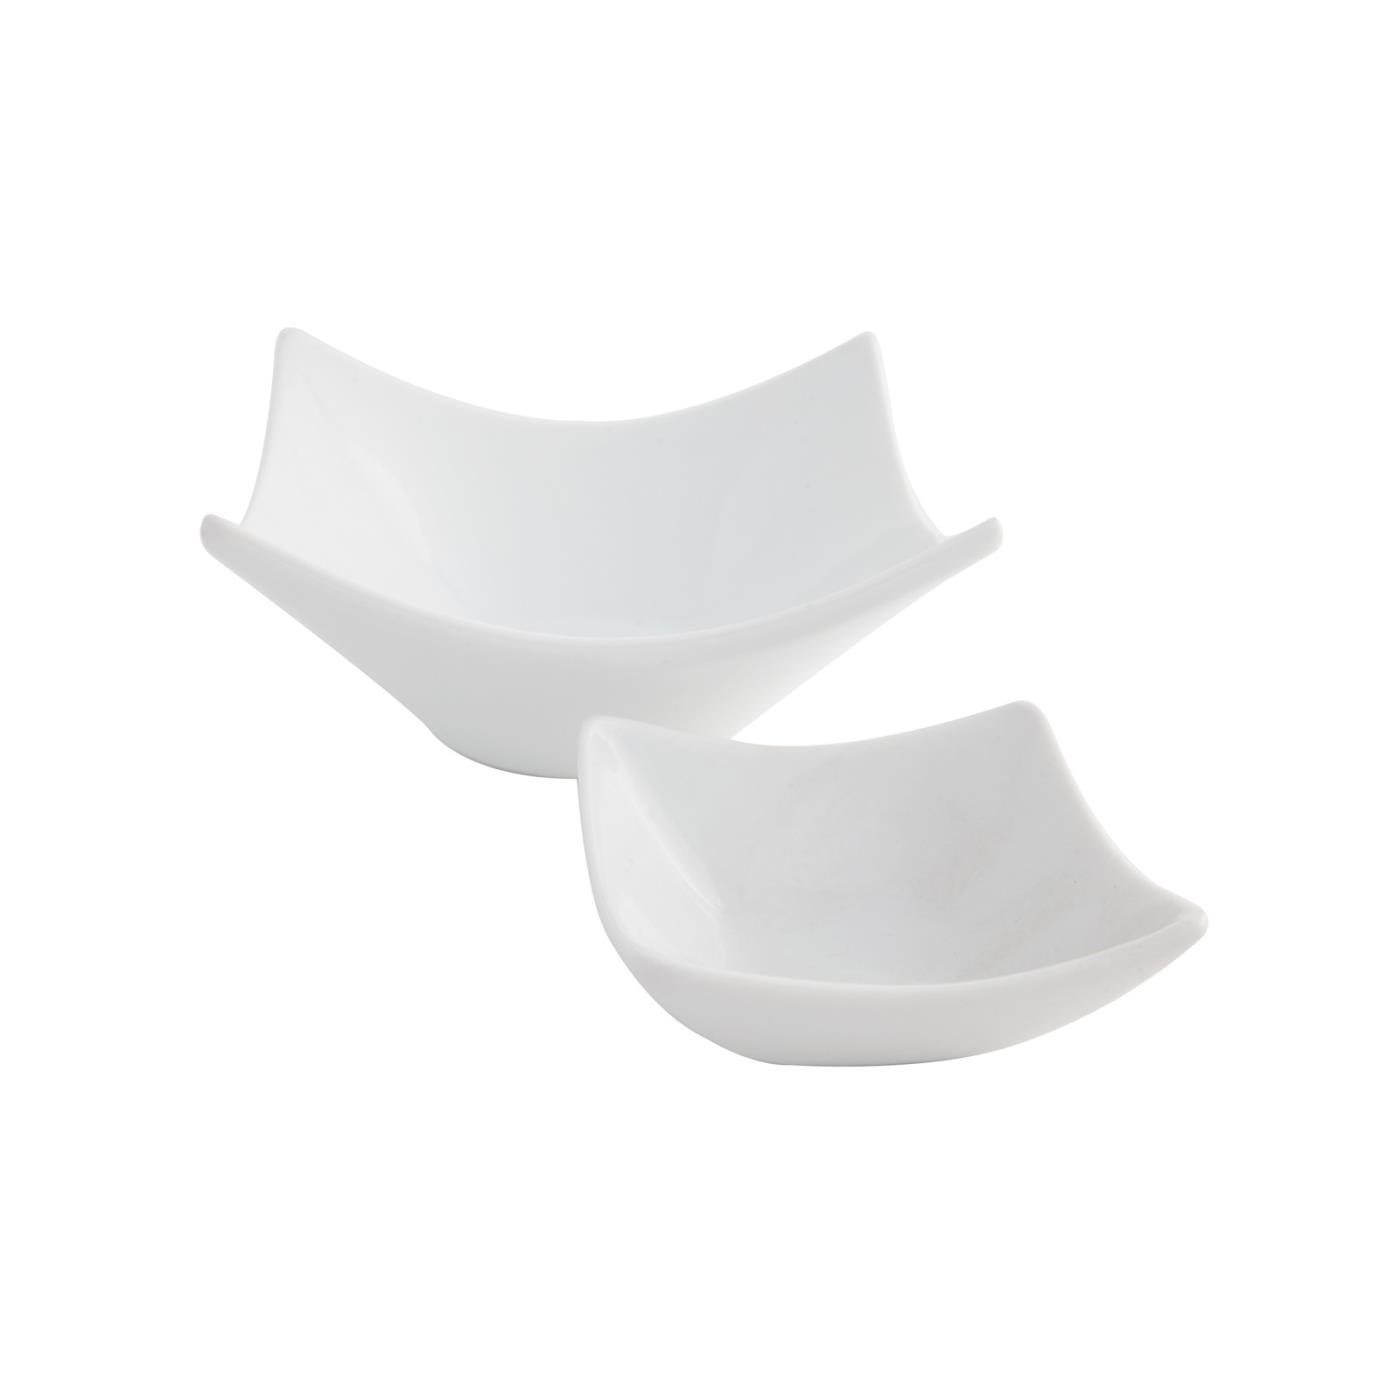 White Square Origami Dish